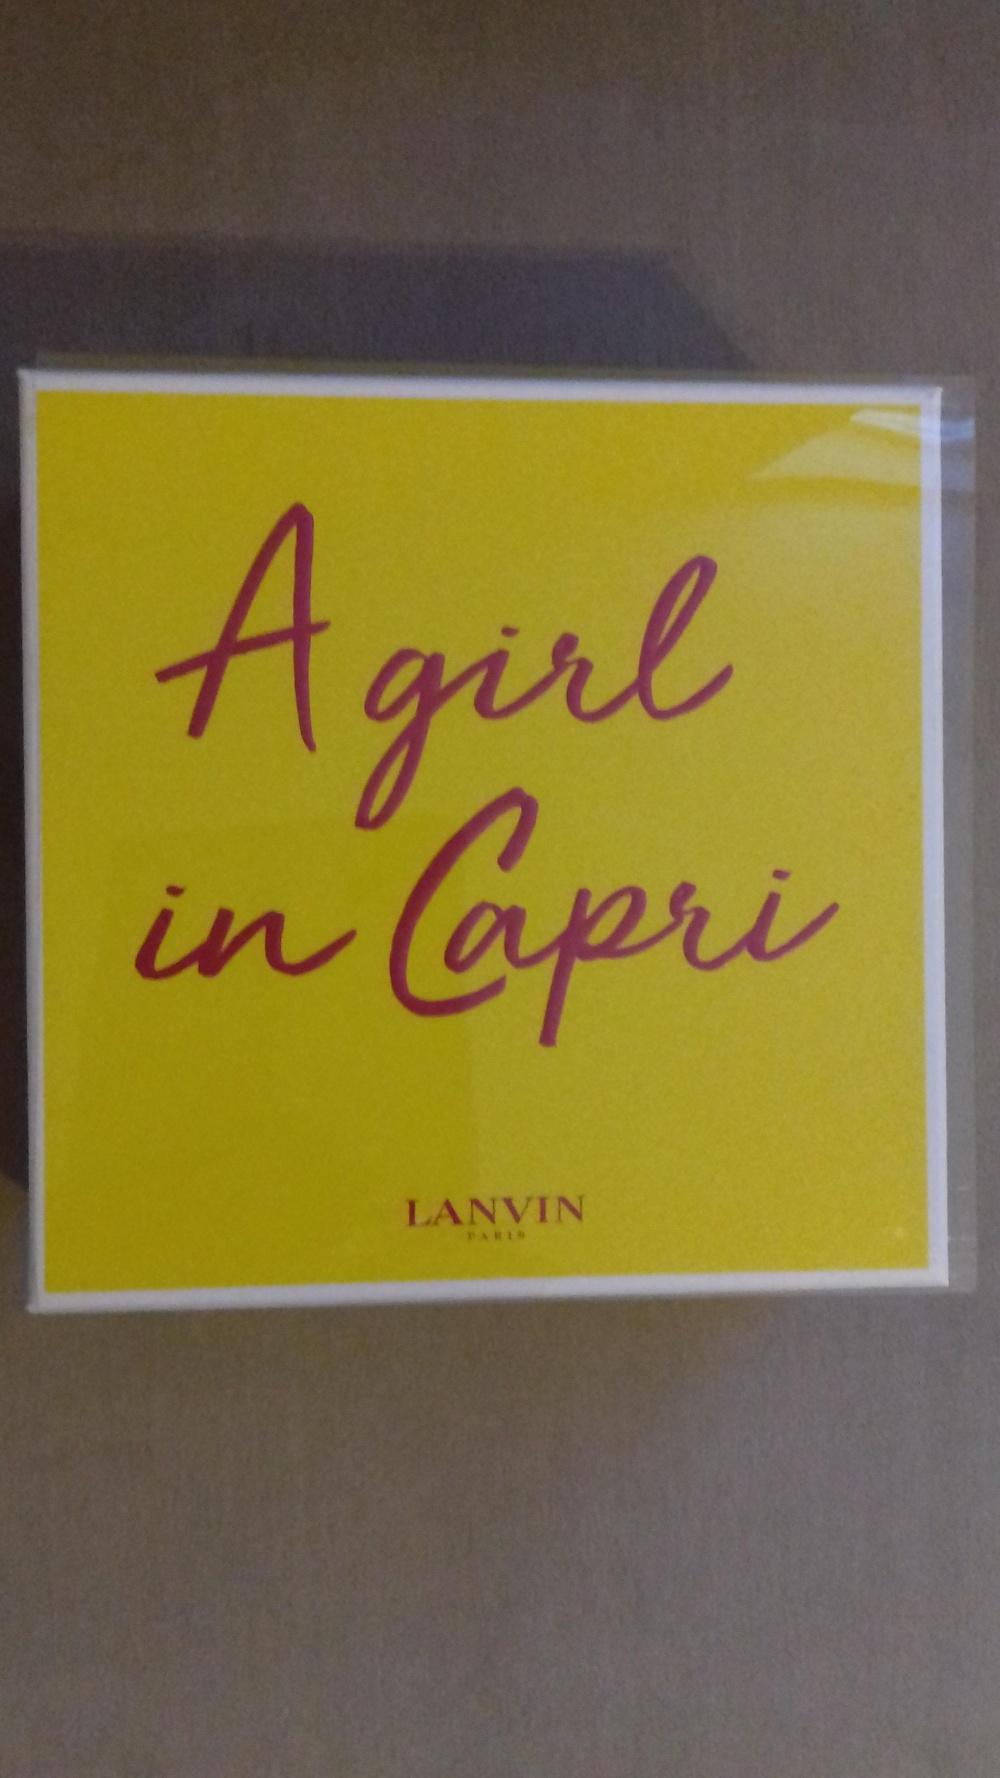 Парфюмерный набор LANVIN, A GIRL IN CAPRI, Туалетная вода 50 мл. и  Лосьон для тела 100 мл.